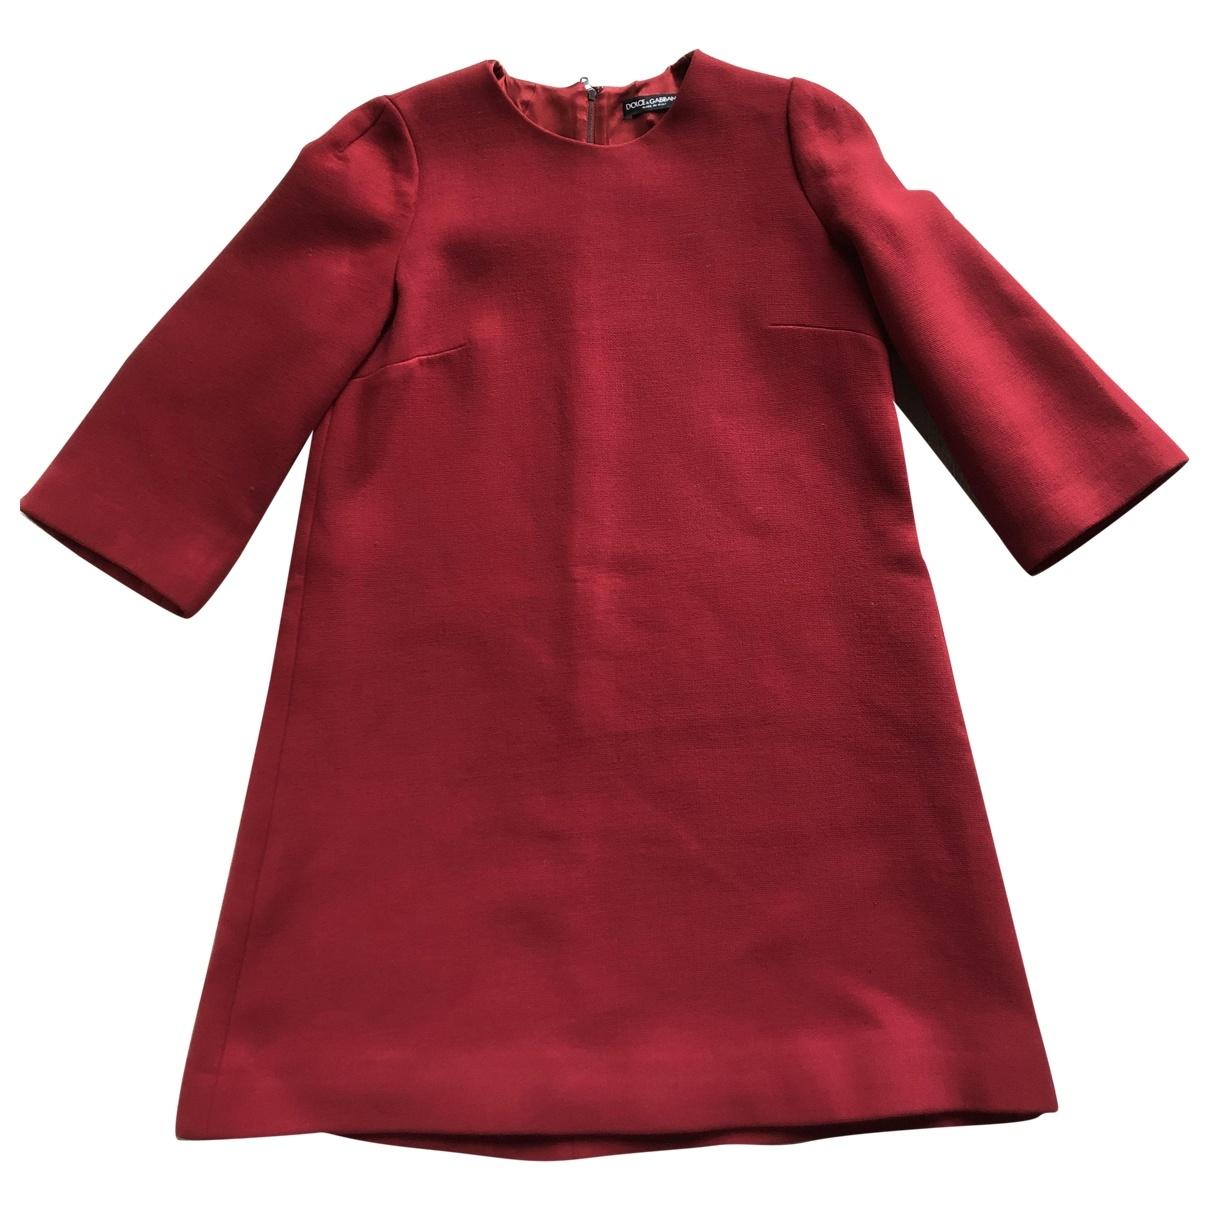 Dolce & Gabbana \N Burgundy Wool dress for Women 44 IT